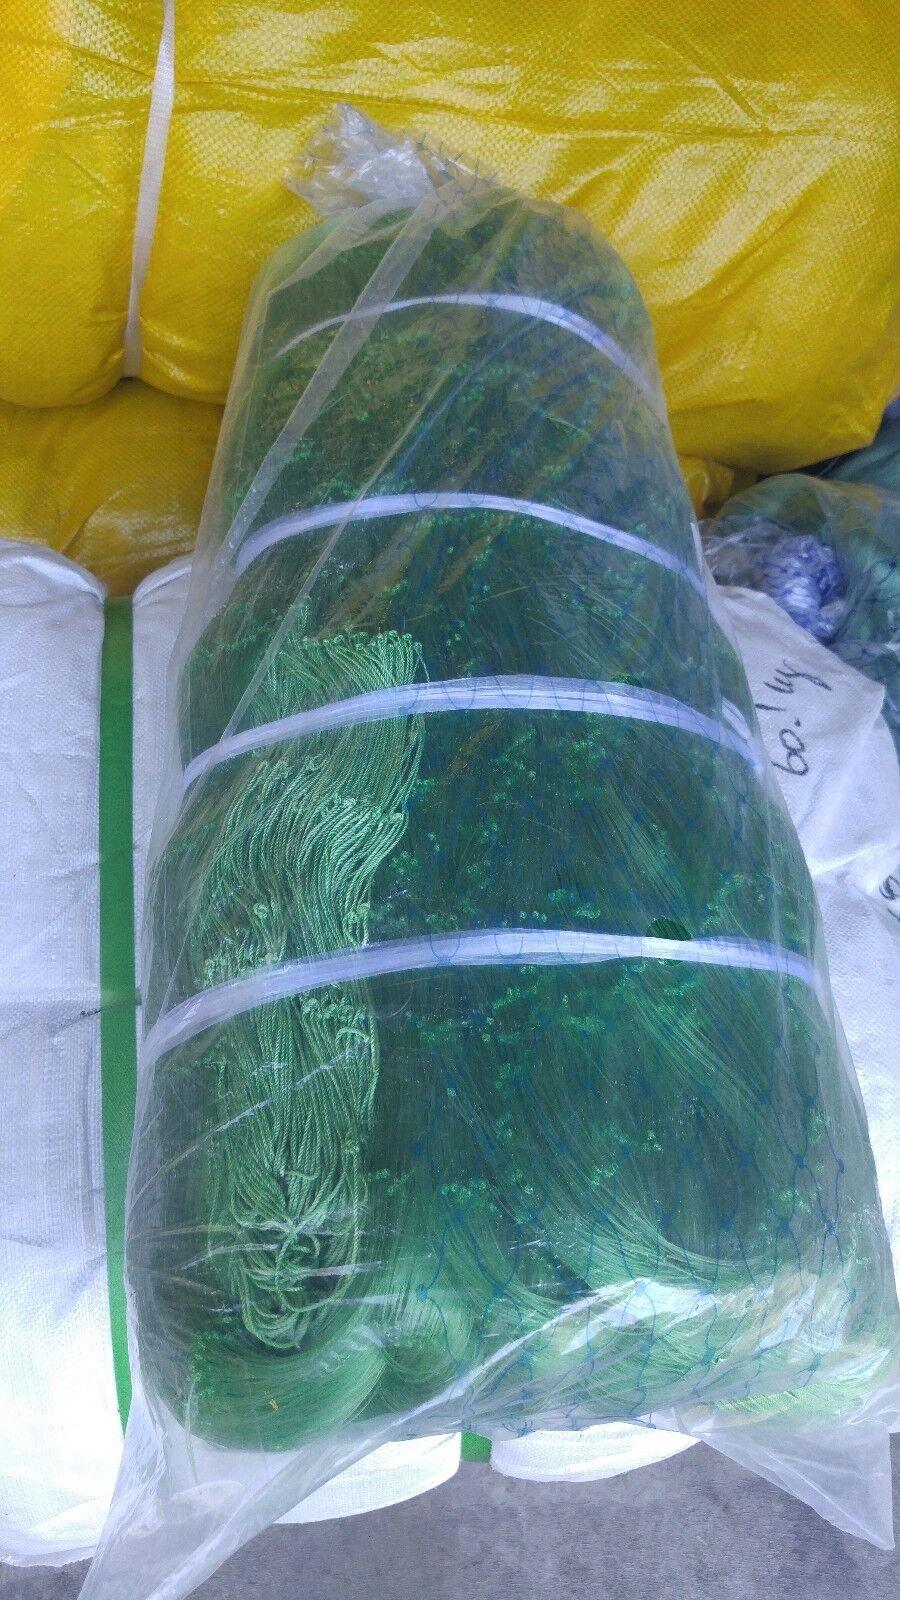 6 inch Gauge 60 mesh 630ft mono fishing net / Gauge inch 16 twine Größe 42a2ab